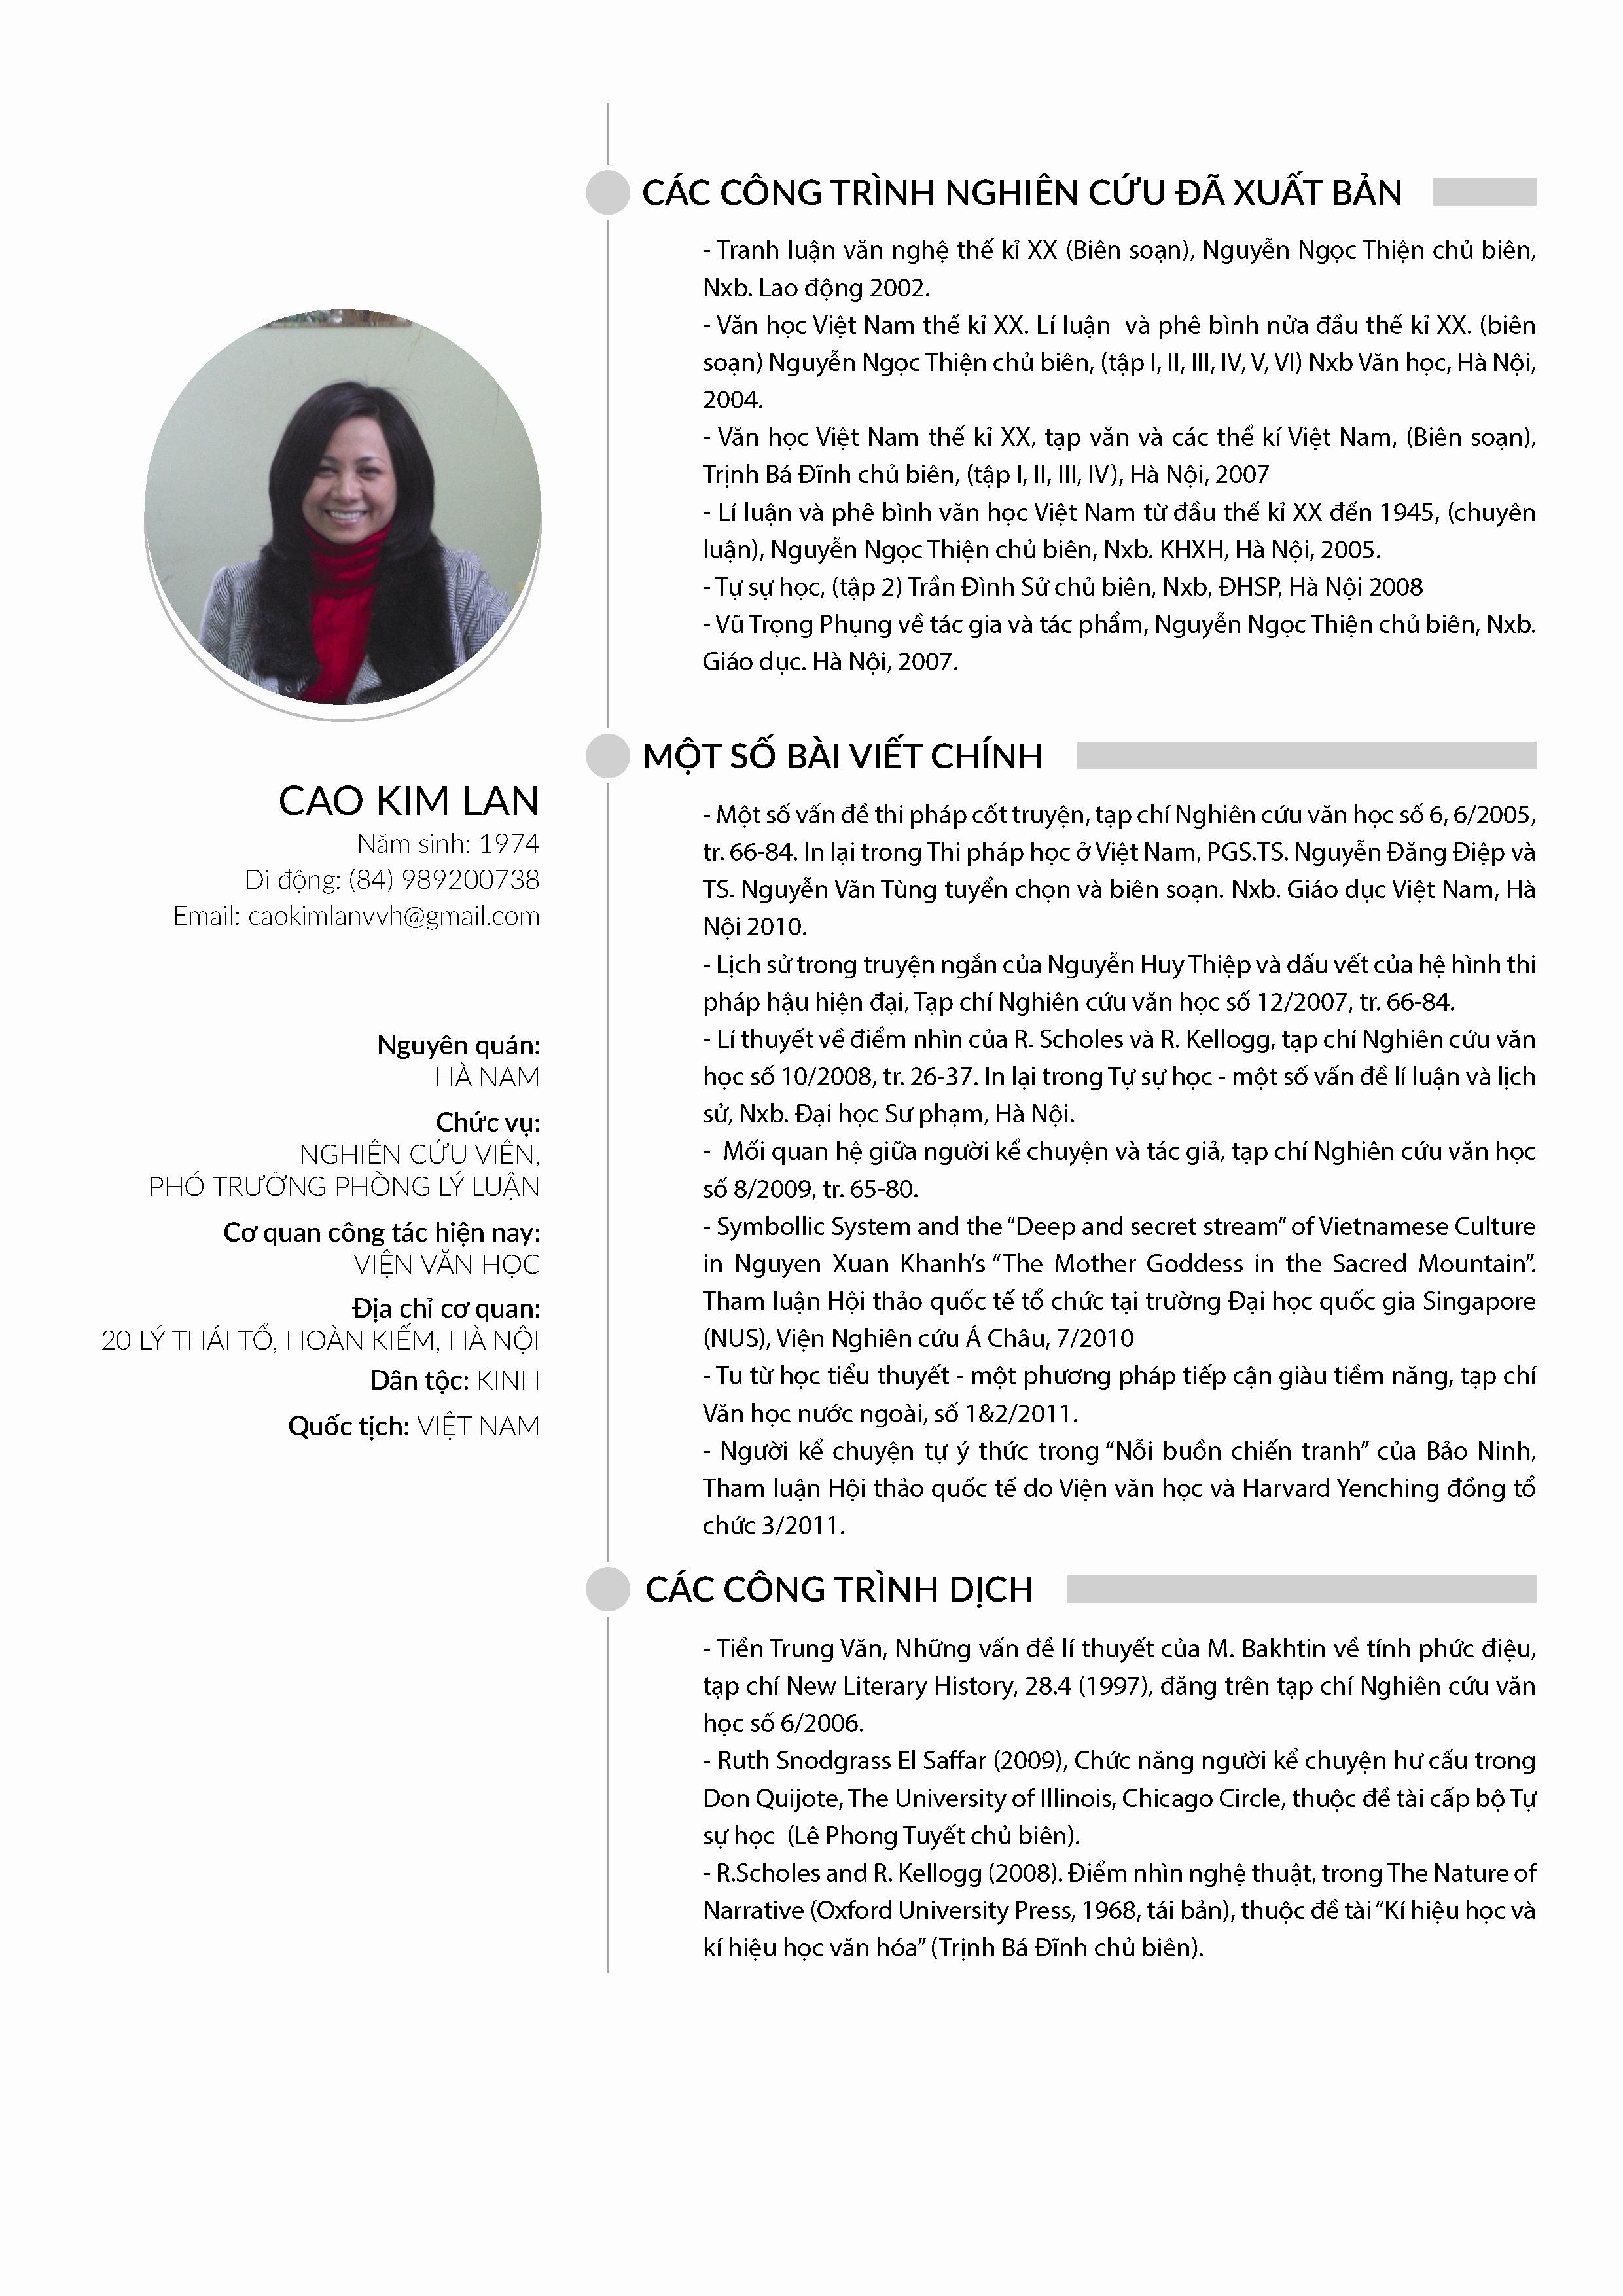 CV CAO KIM LAN-01 (2)